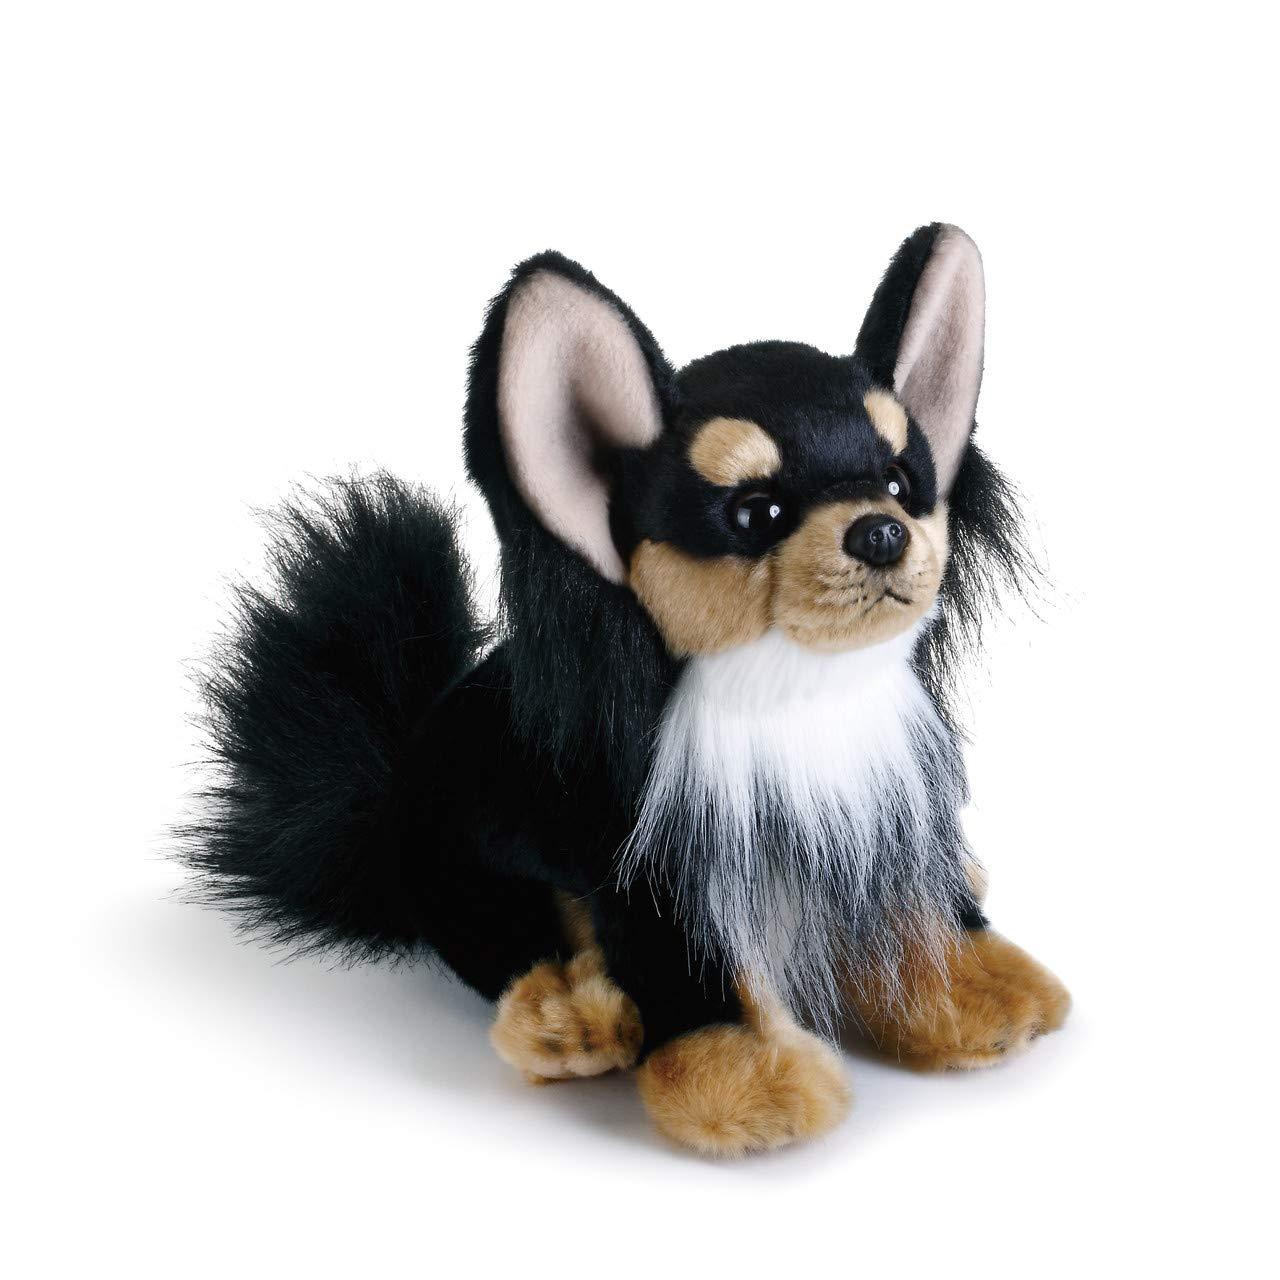 DEMDACO Black Long-Haired Chihuahua Childrens Plush Beanbag Stuffed Animal Toy